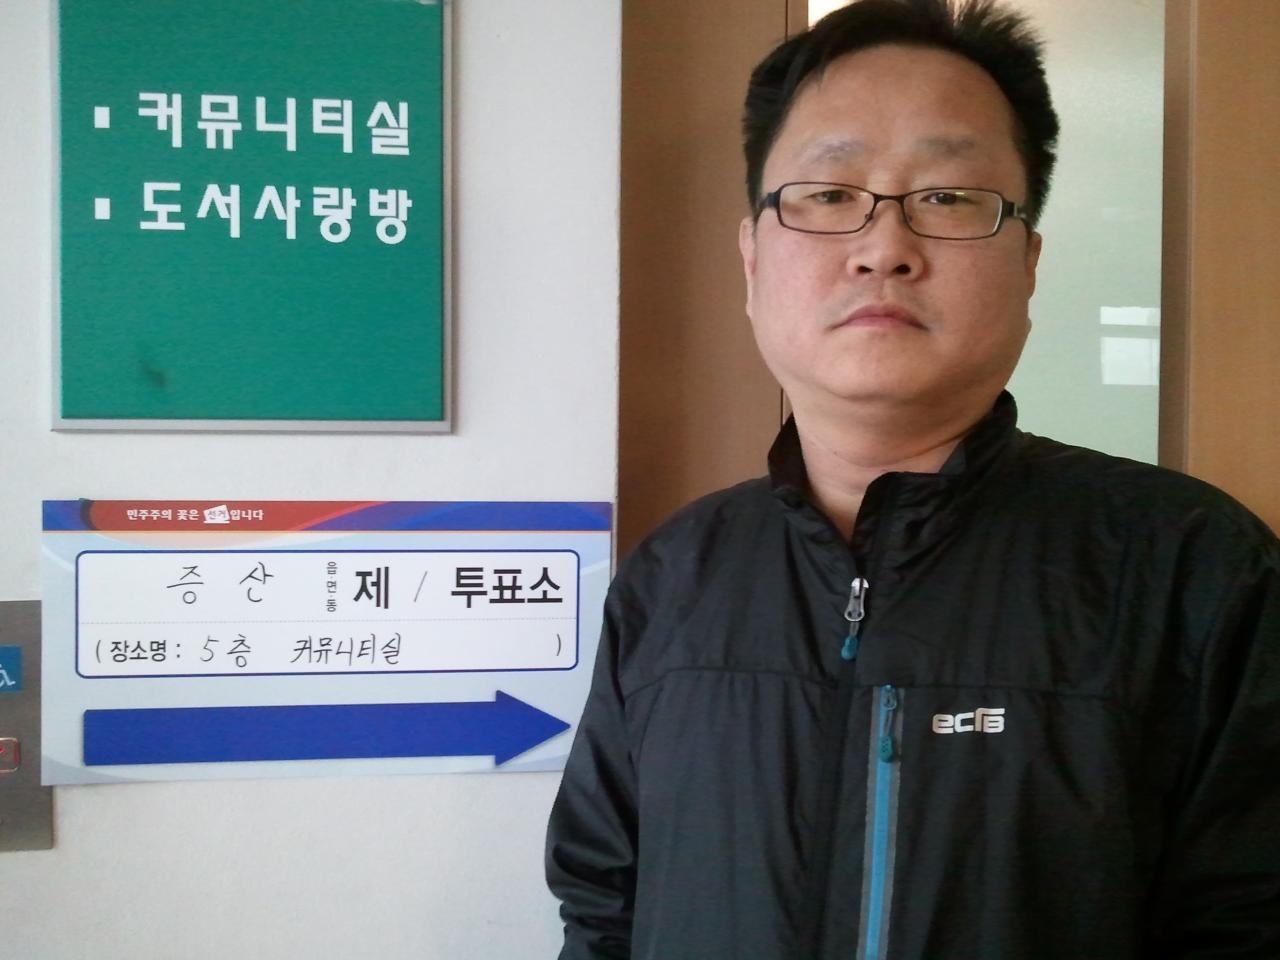 @maengnaeng 닥치고 투표